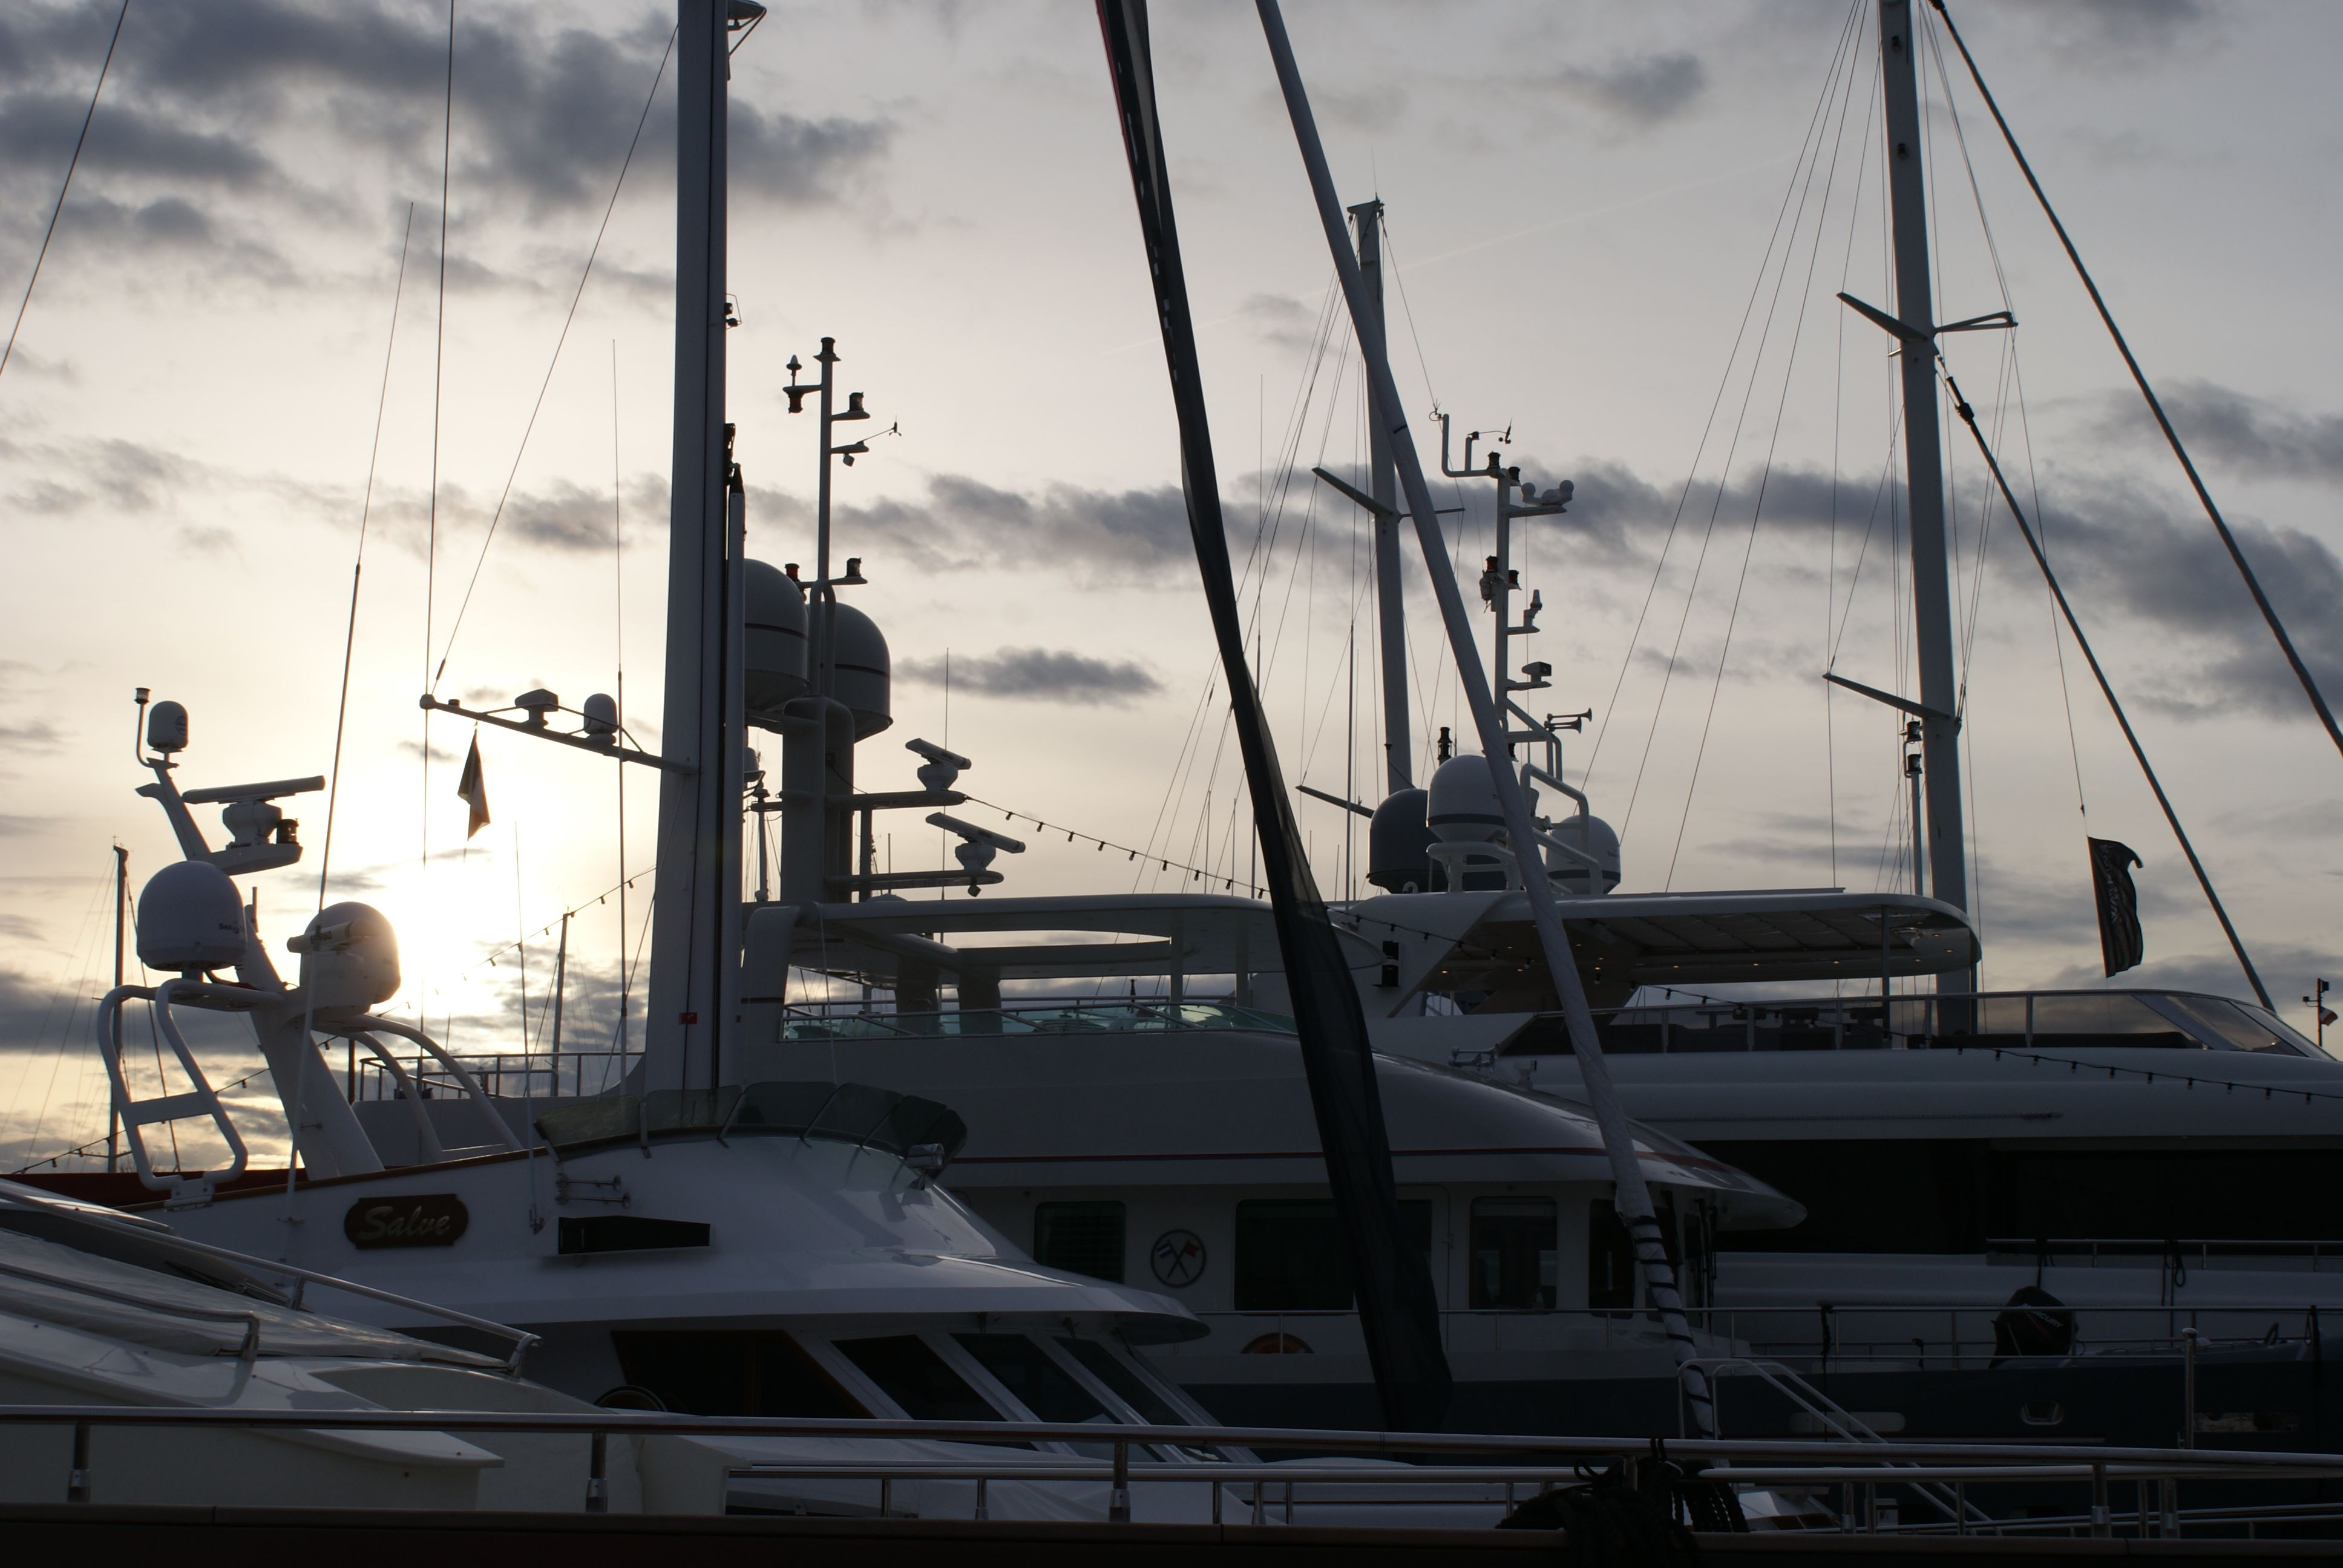 Superyachts - Friday 13th closure